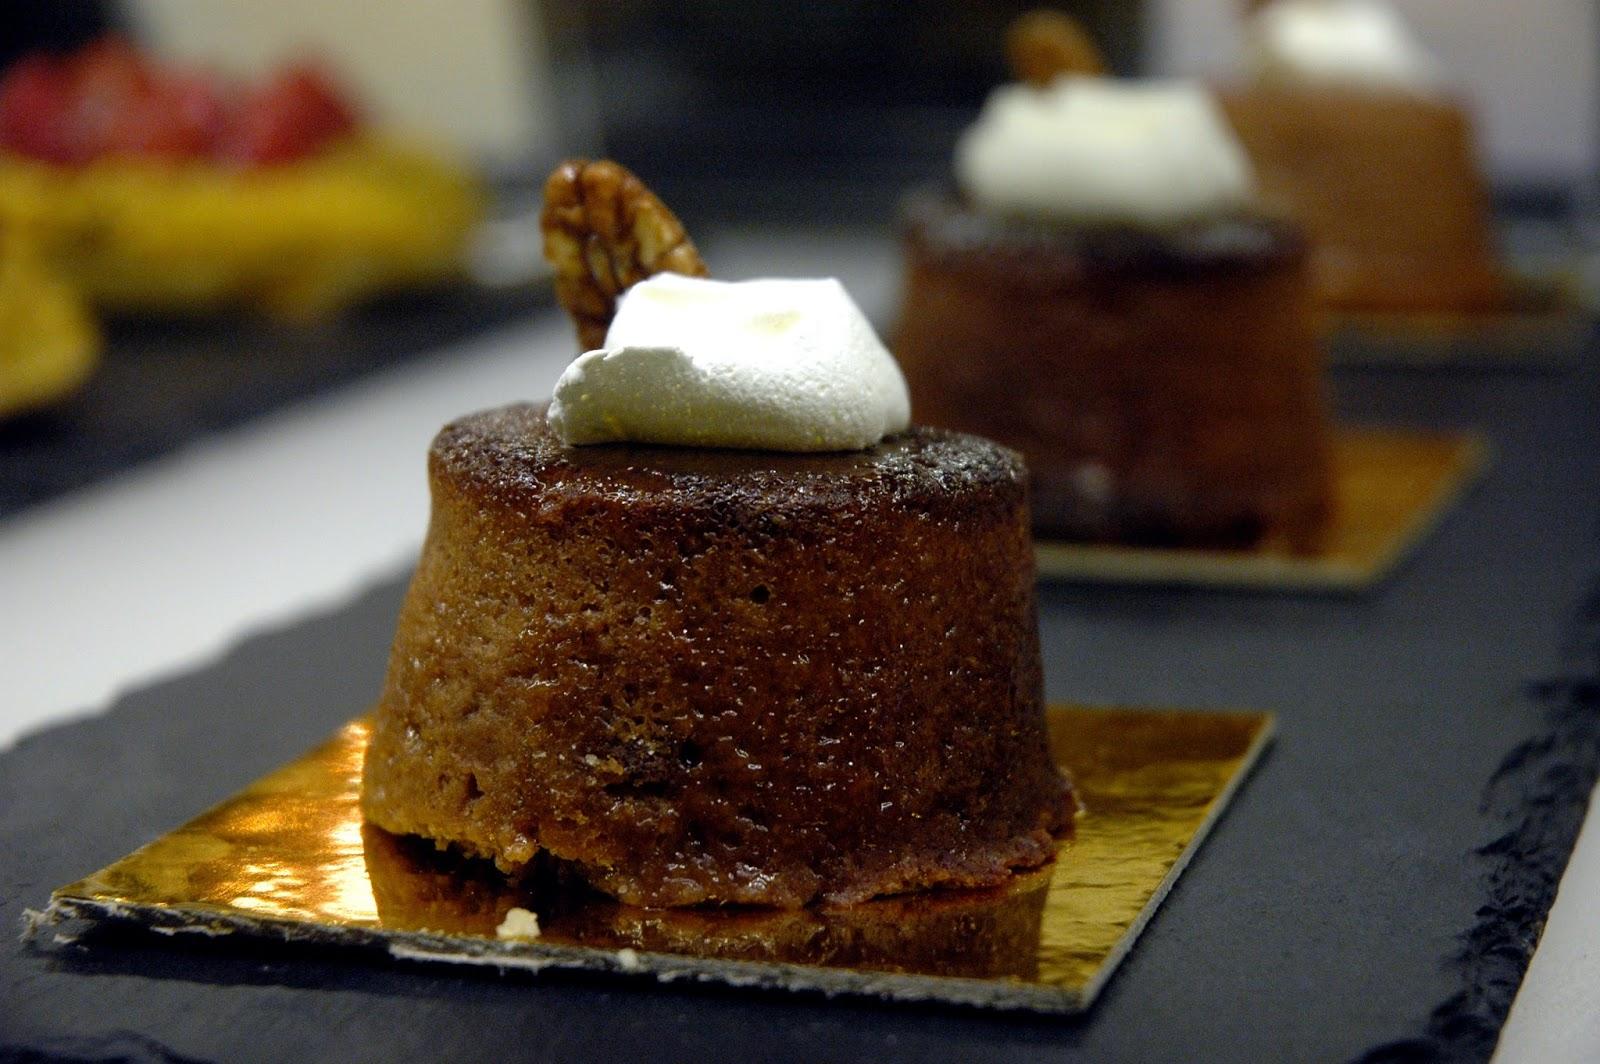 Chocolate Shards For Cake Decorating